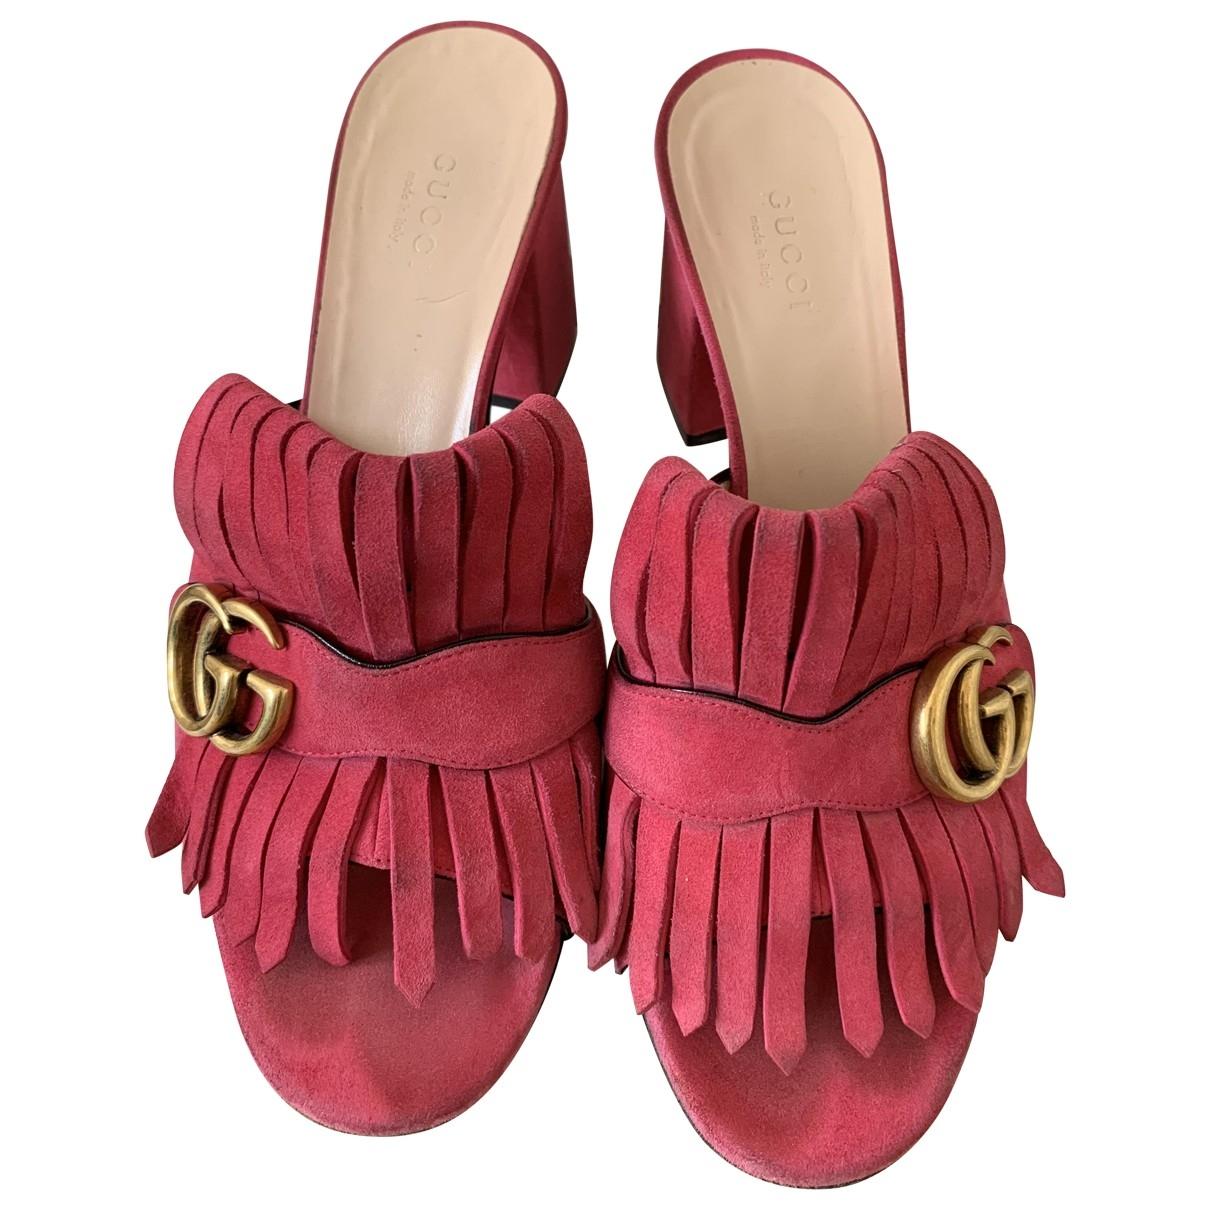 Gucci \N Pink Suede Mules & Clogs for Women 38.5 EU